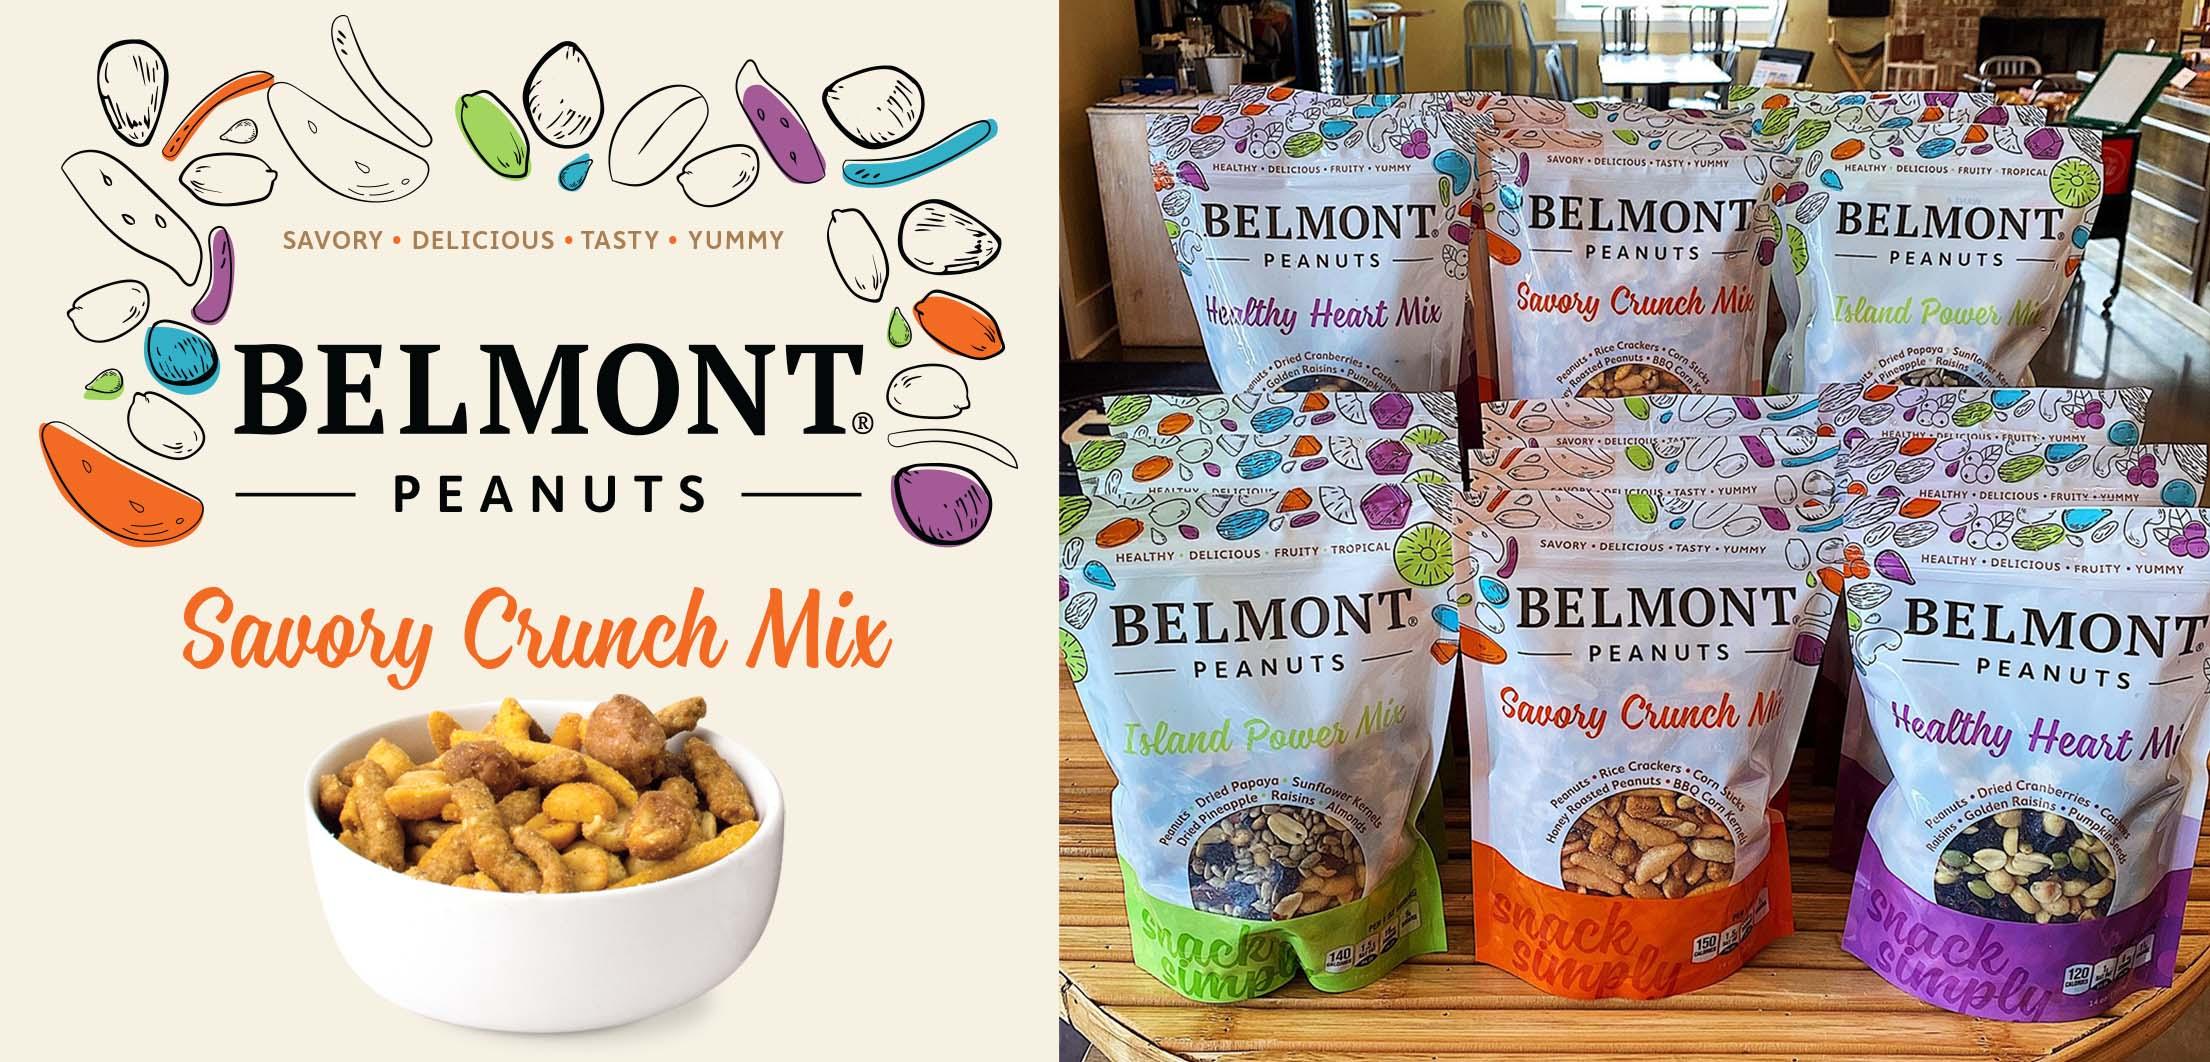 Belmont Peanuts mix bag label design by Red Chalk Studios